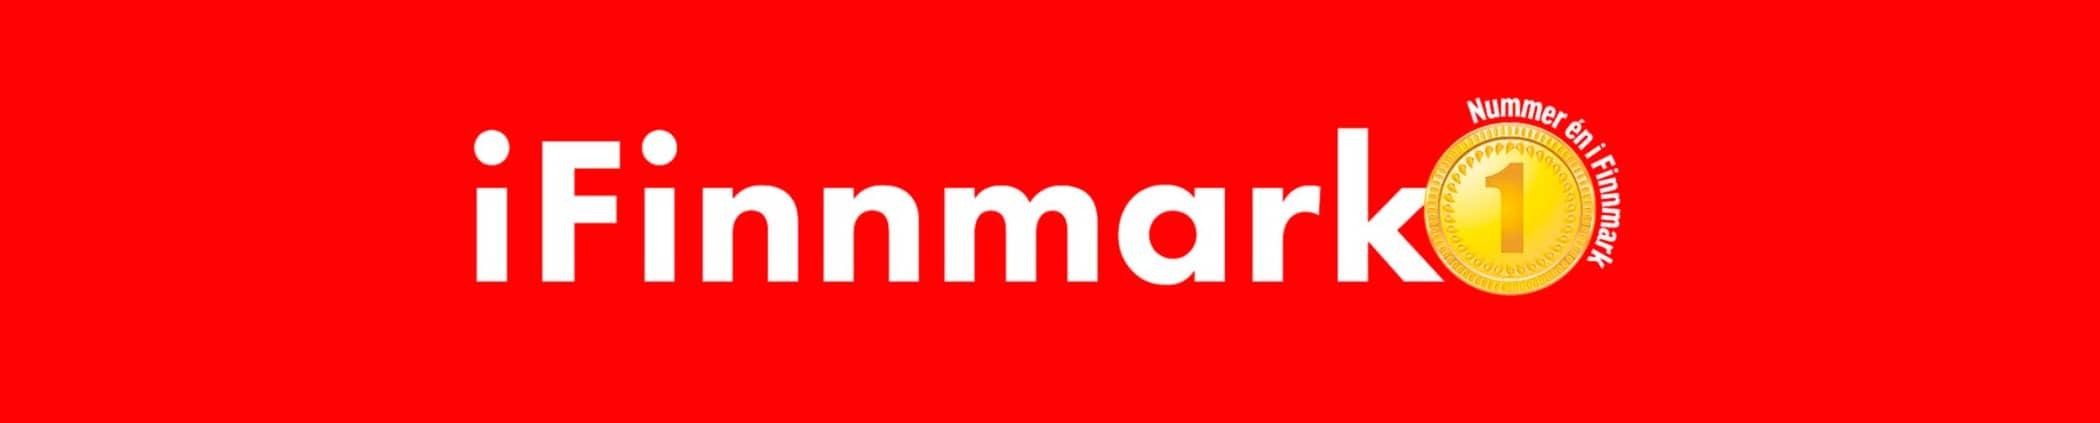 Logo 2500 smalere.jpg